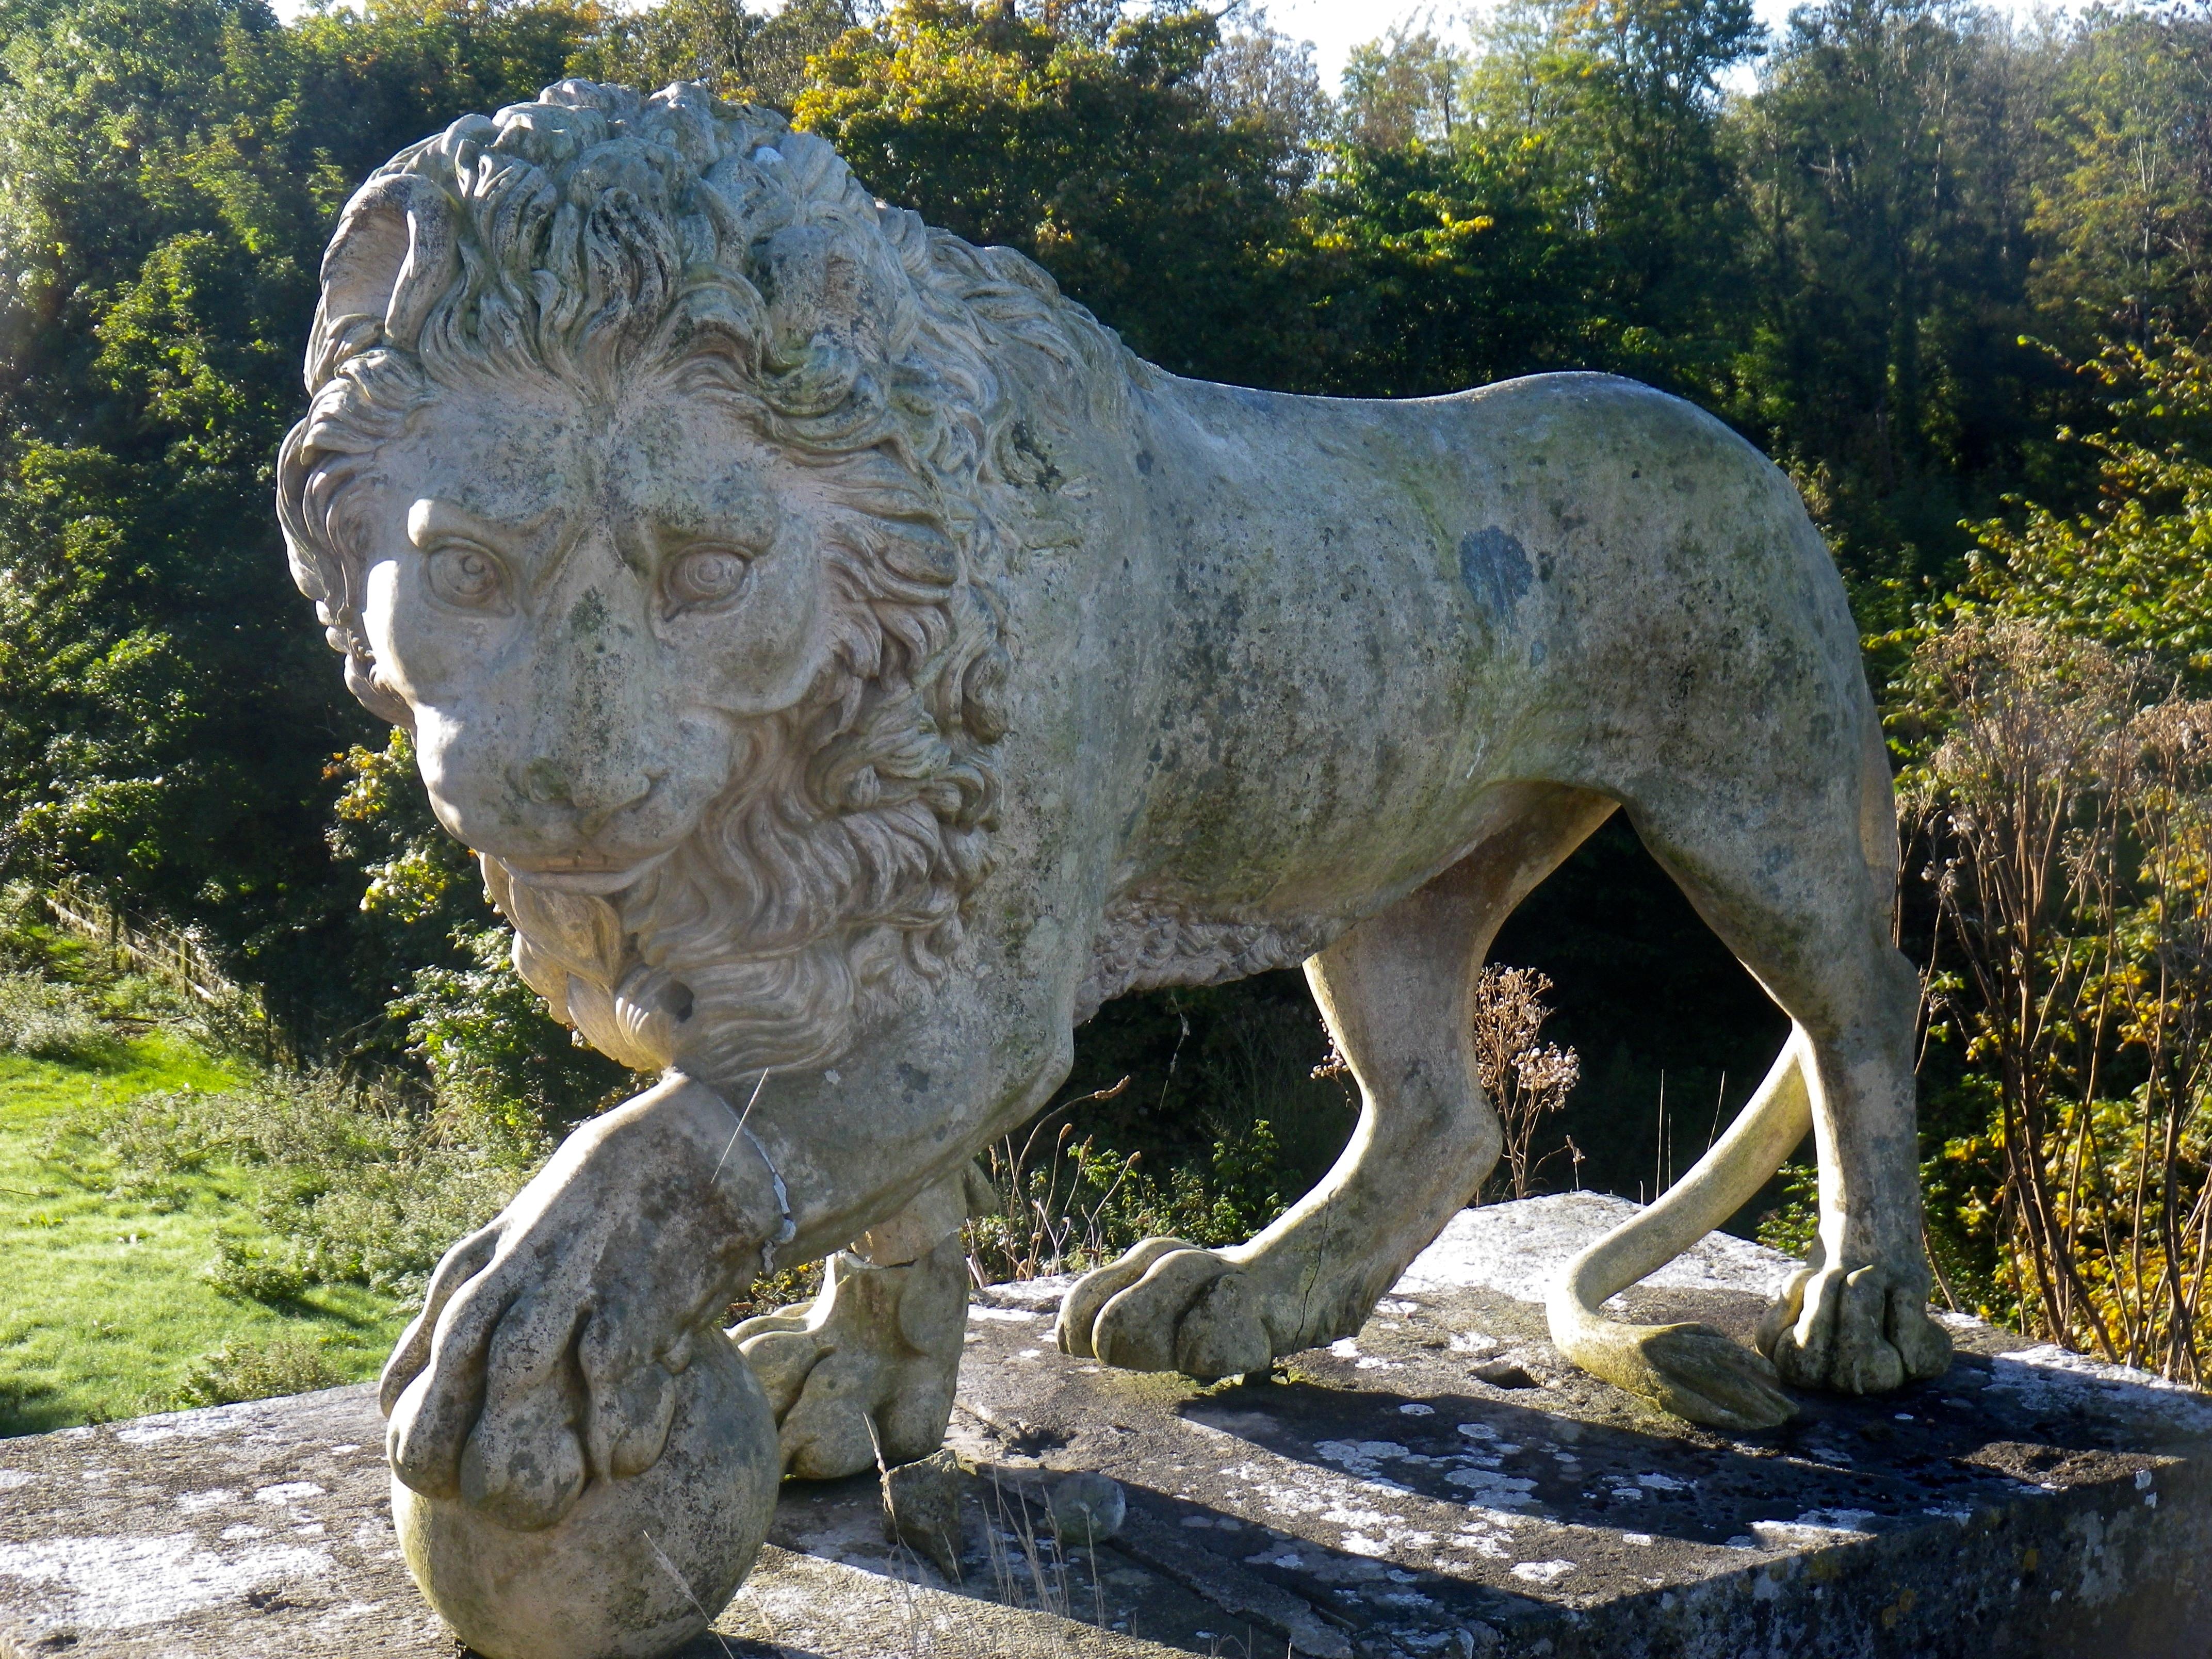 Mote_Park_lion_iii.jpg#asset:1284